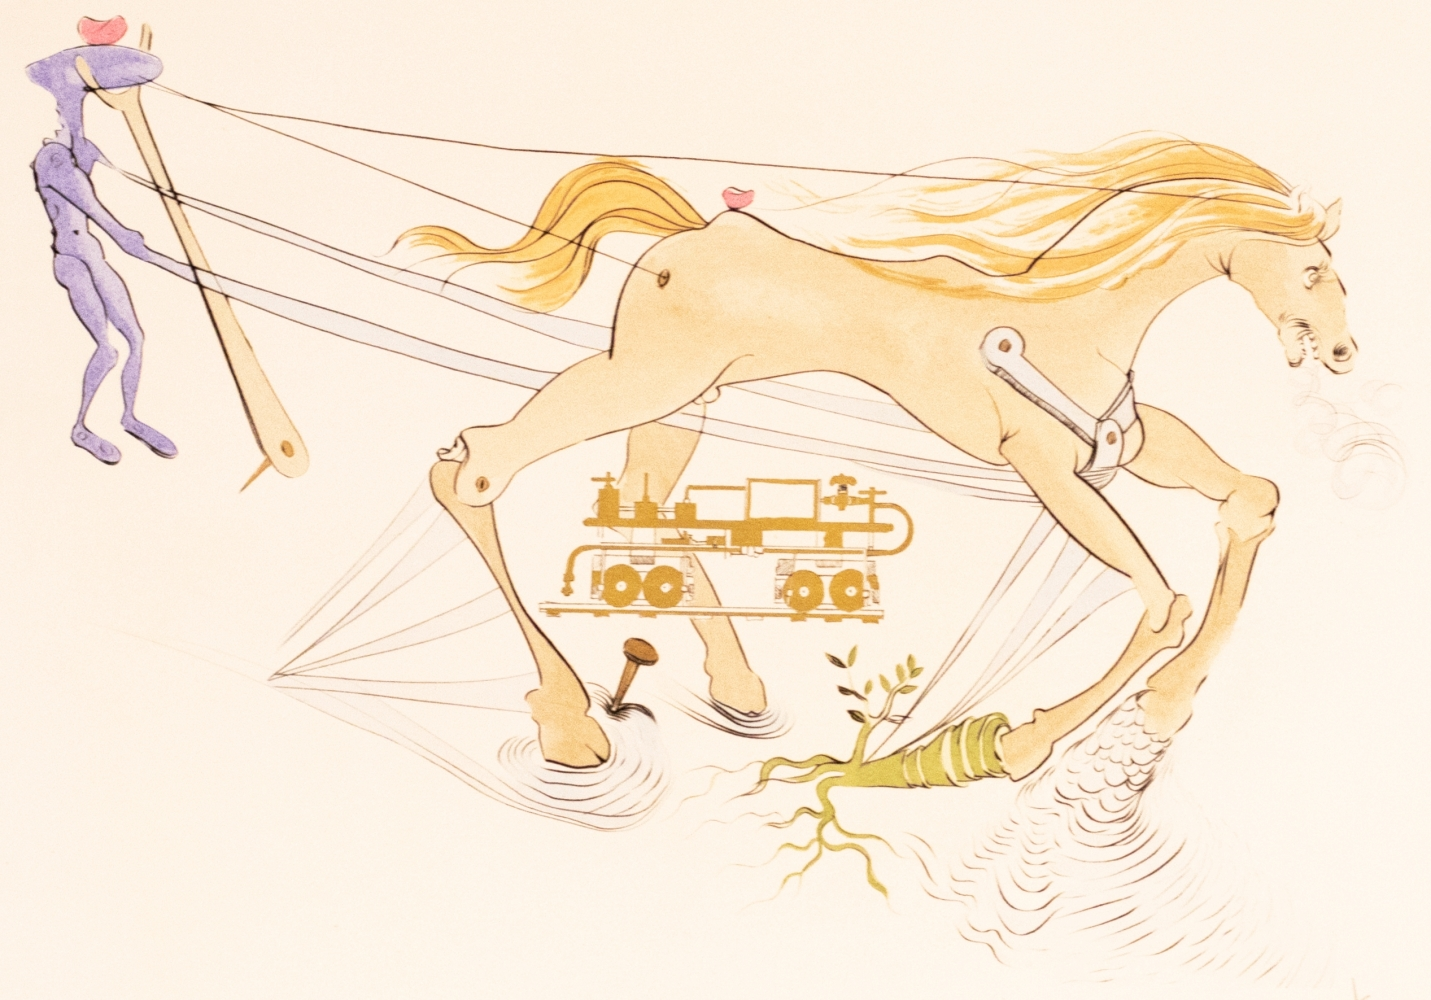 Salvador Dali, Le Frien Hudraulique, From Hommage a Leonardo da Vinci, 1975, Engraving with Pochoir on Arches paper, 22.25 × 29.875 inches, Salvador Dali signed prints, Salvador Dali Prints for sale